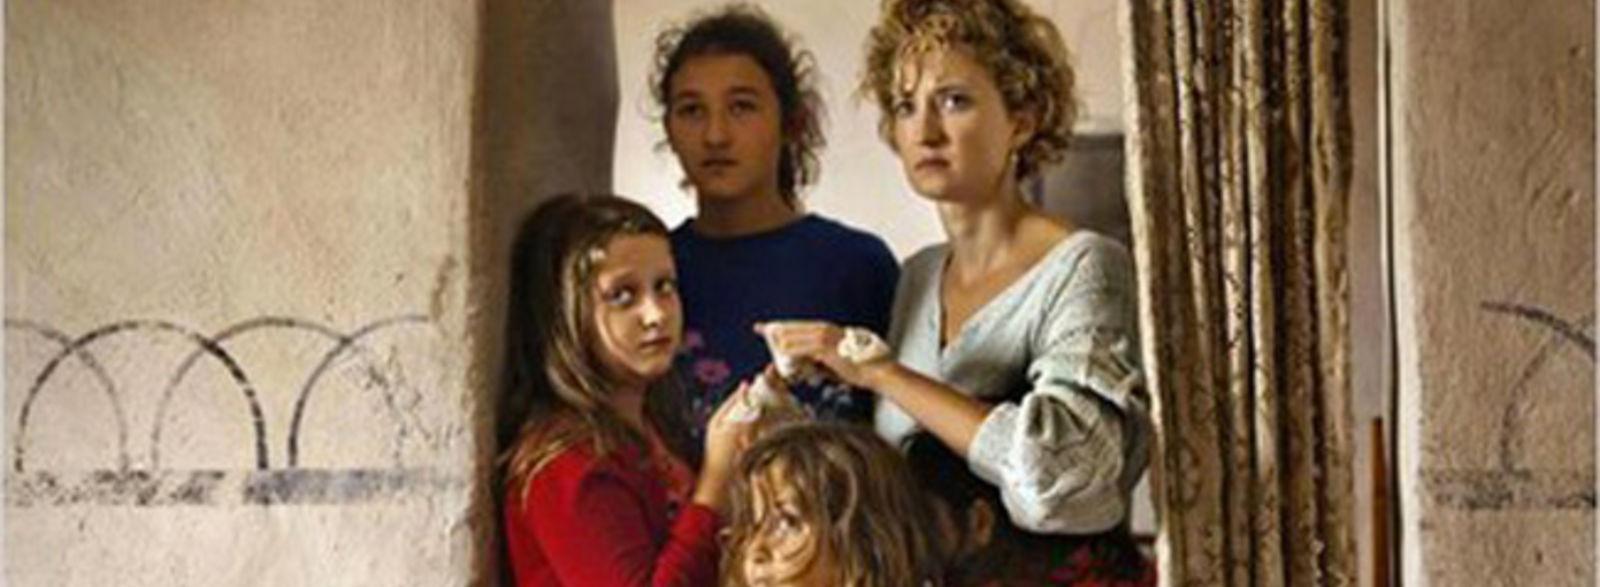 Cannes 2014 : «Welcome to New York» d'Abel Ferrara; «Les Merveilles» d'Alice Rohrwacher ; «Brooklyn» de Pascal Tessaud